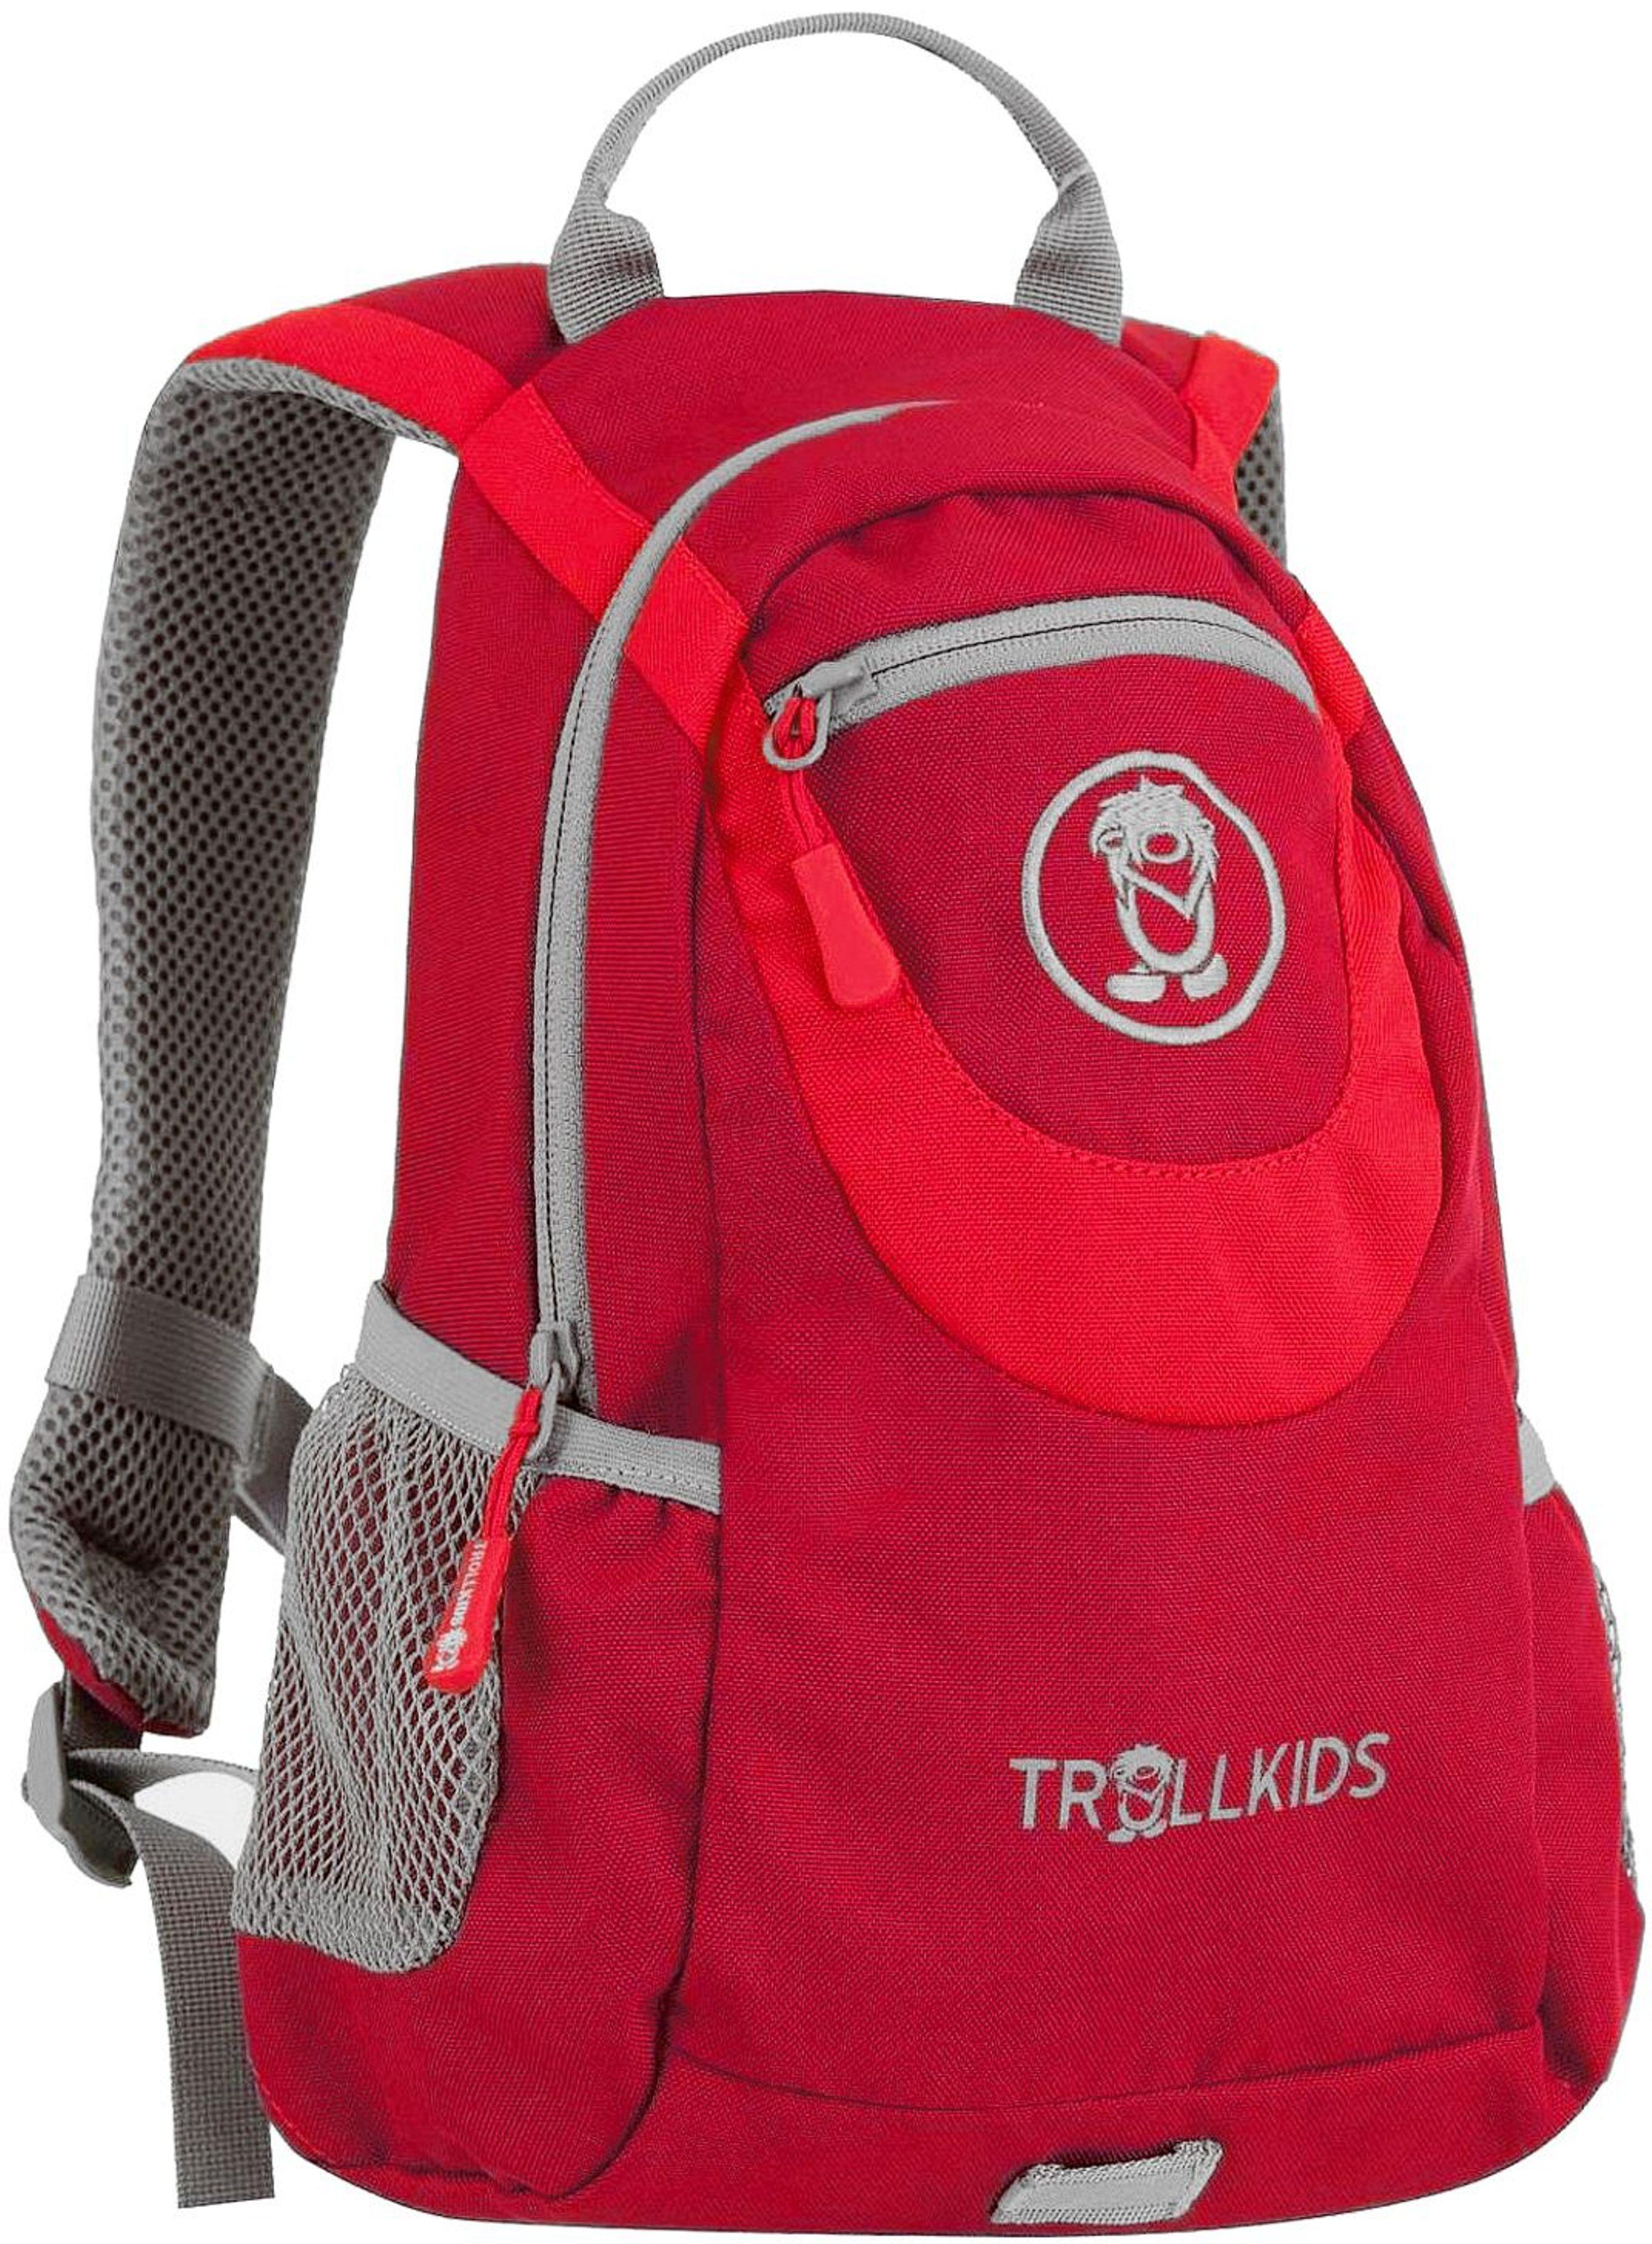 Trollkids Trollhavn Daypack S, 7 L Bright Red